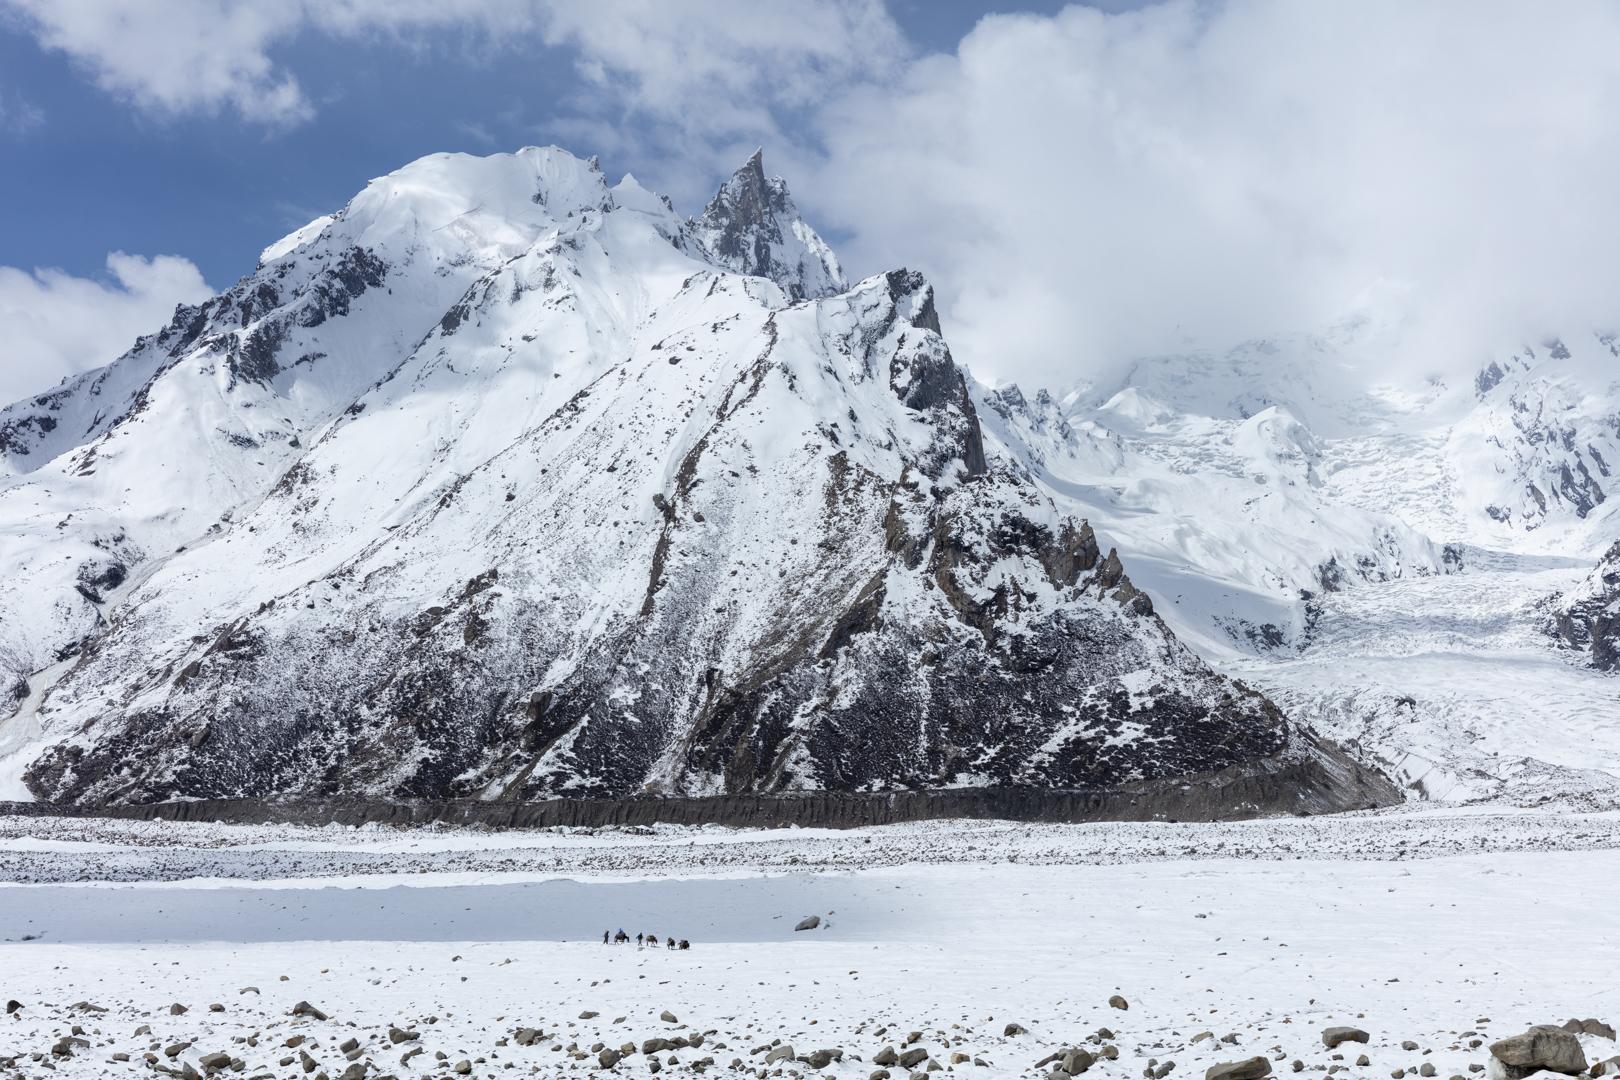 Porters, Biafo Glacier, Panmah Muztagh, Karakoram Mountain, Pakistan